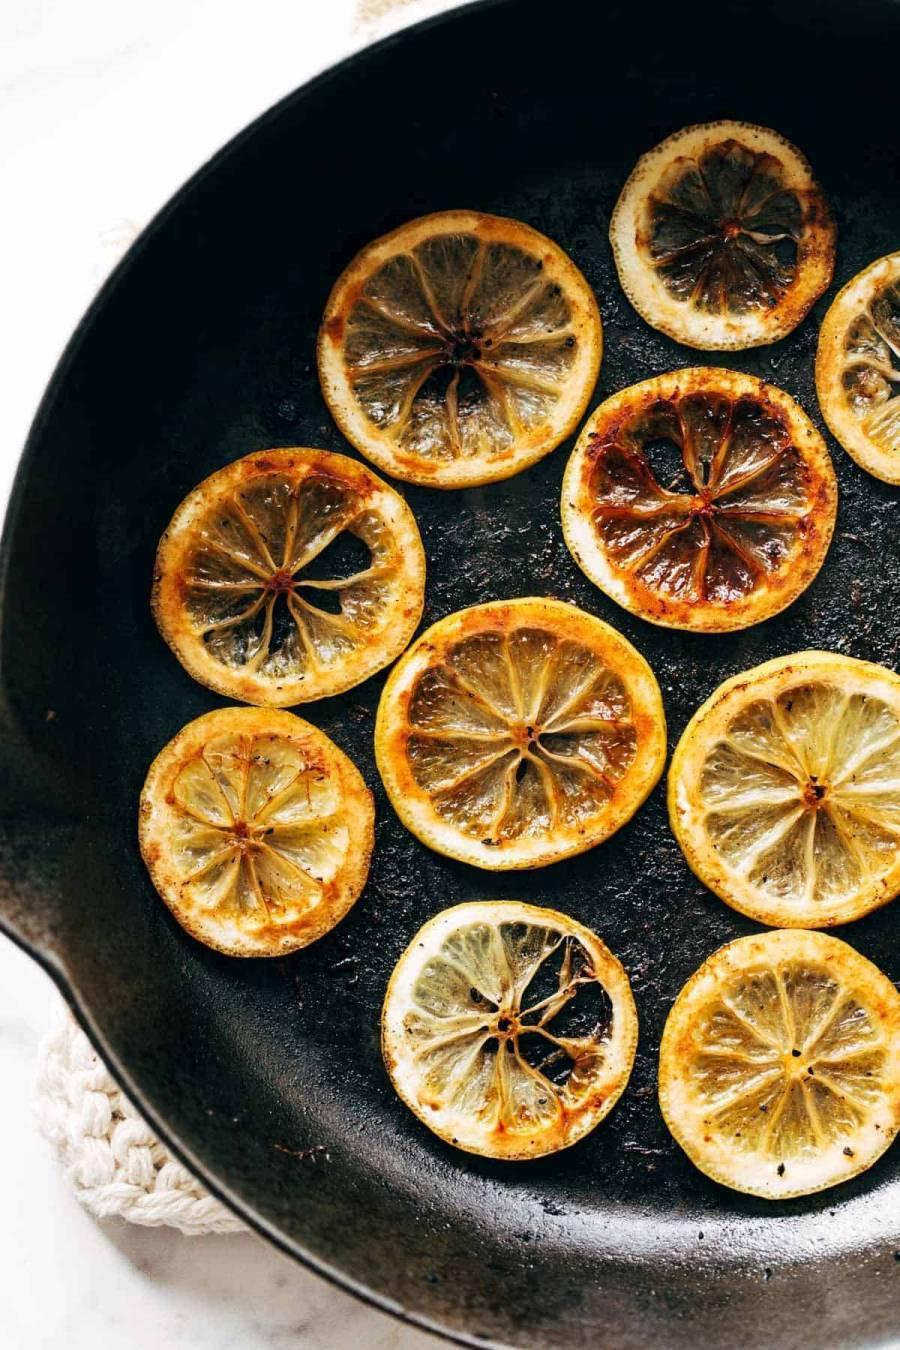 Sauteed lemons in a pan